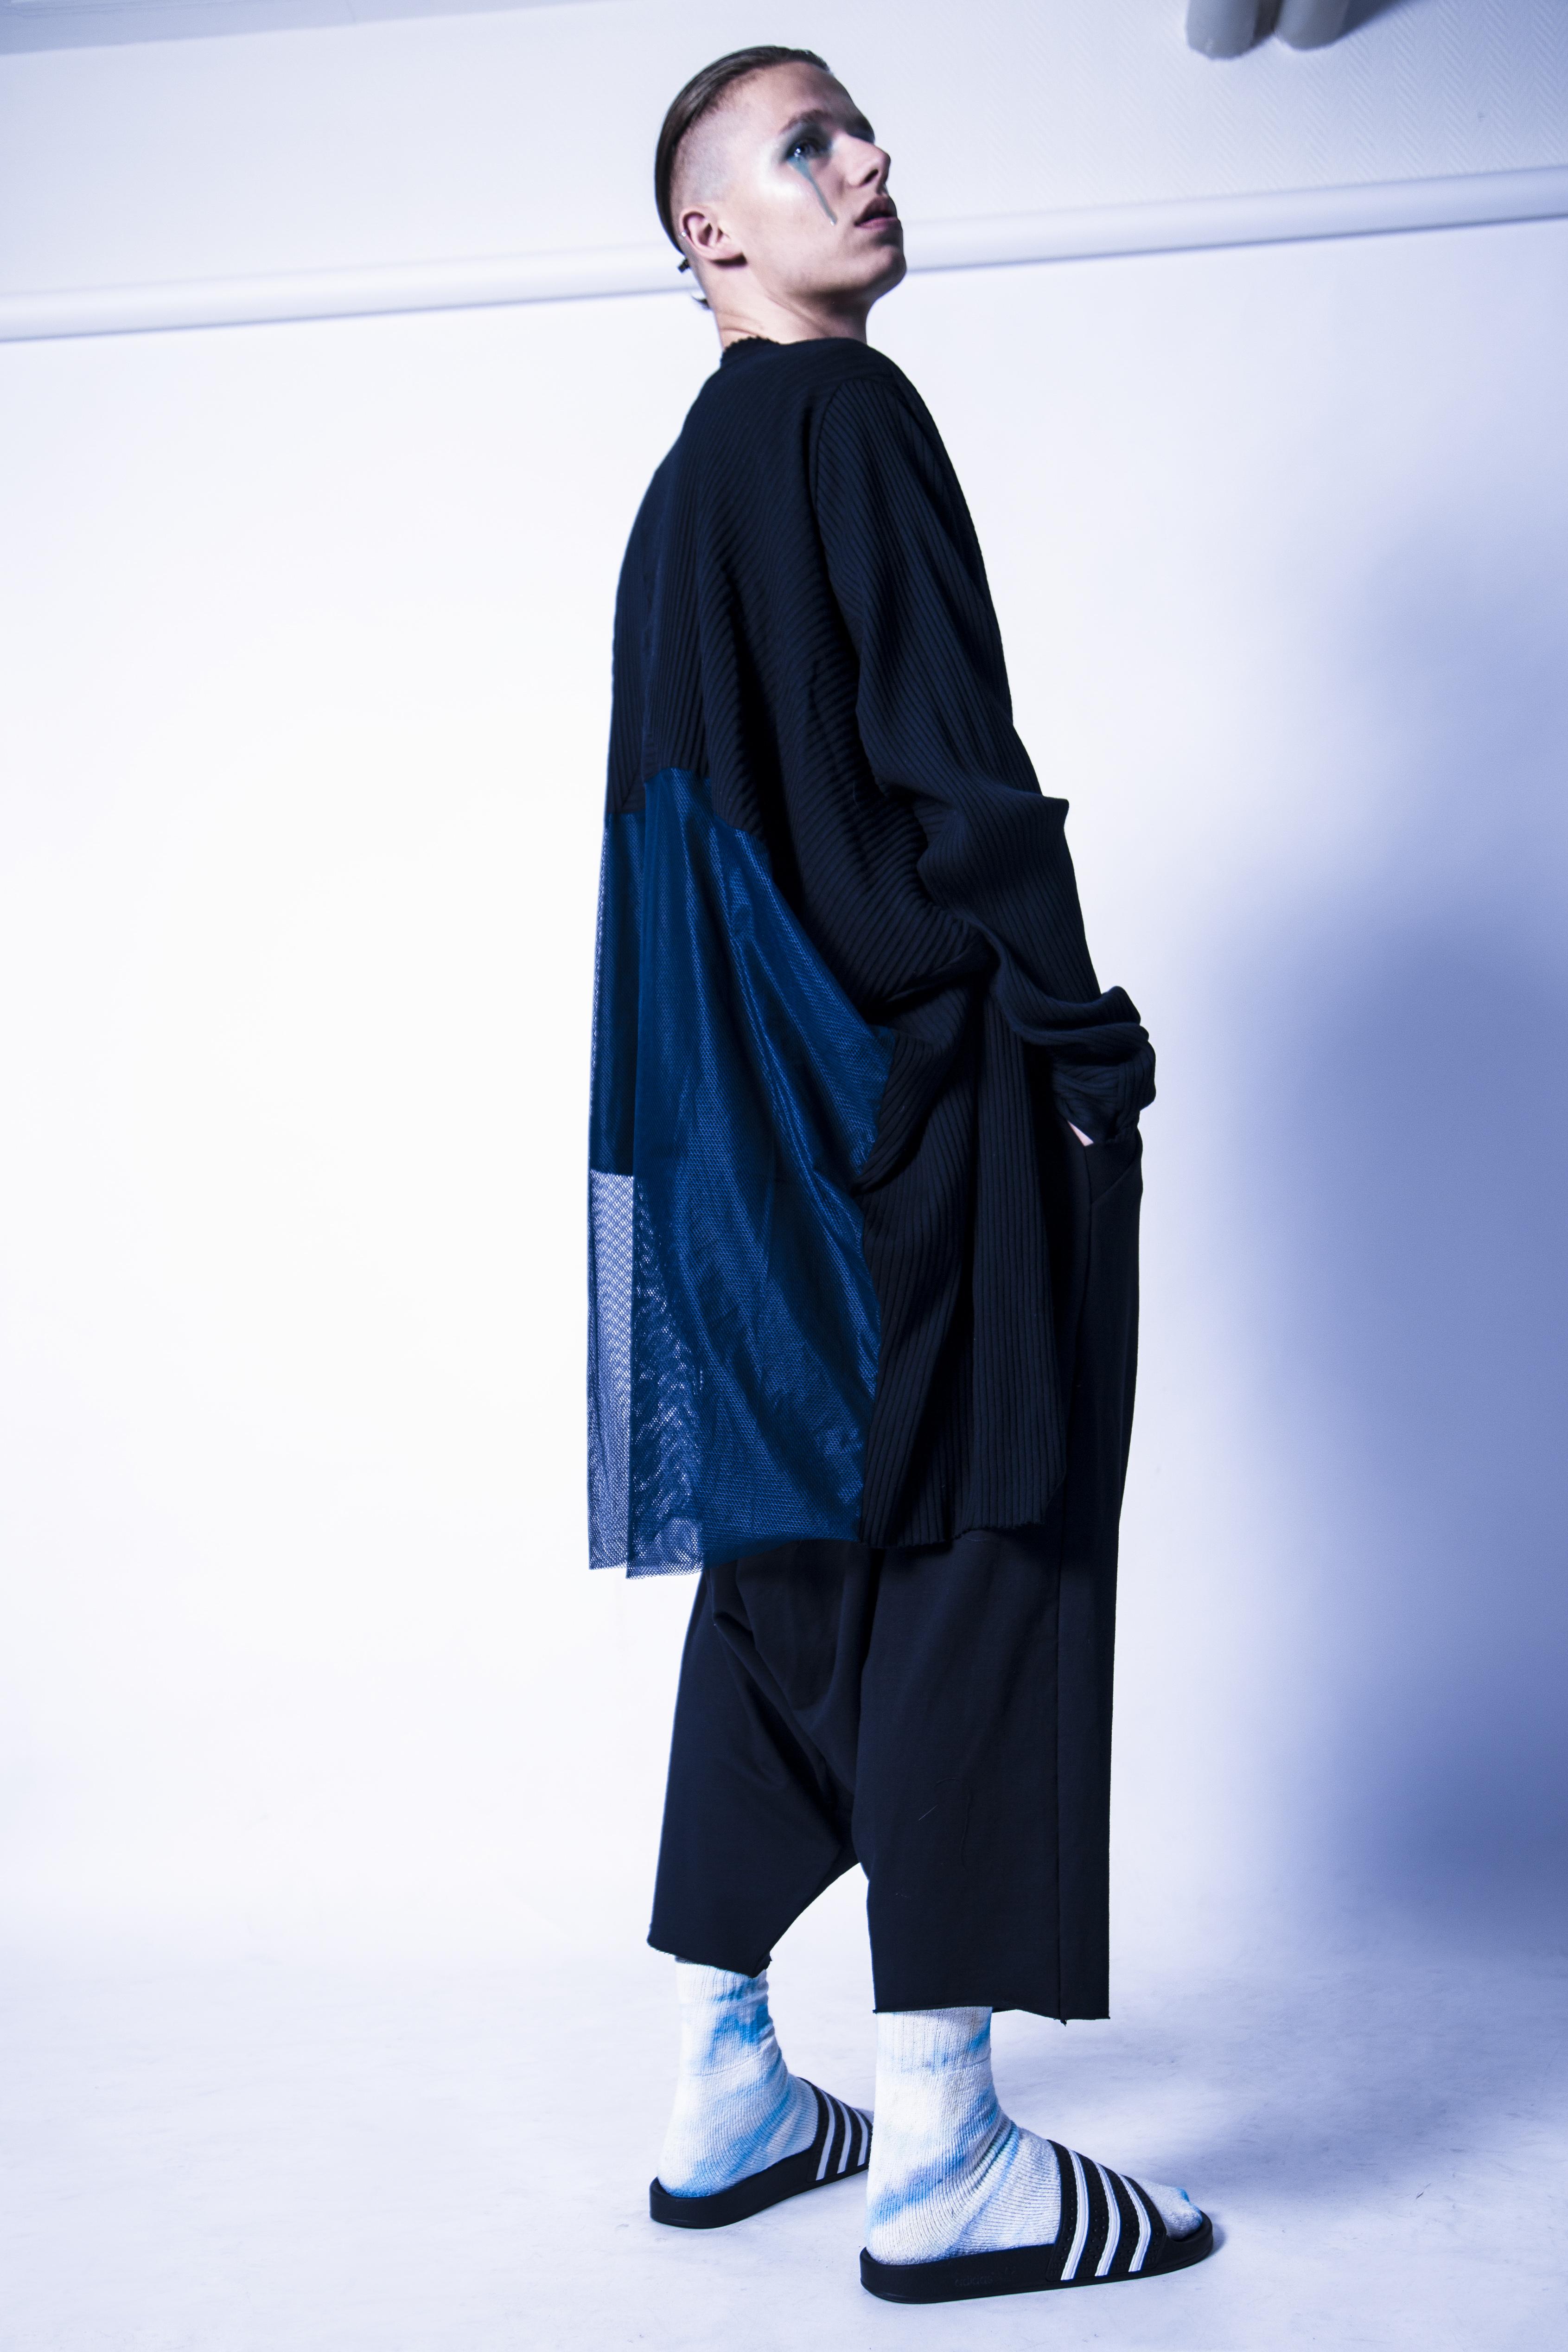 nataliakandula_nicosutoraw1516_outfit8-1